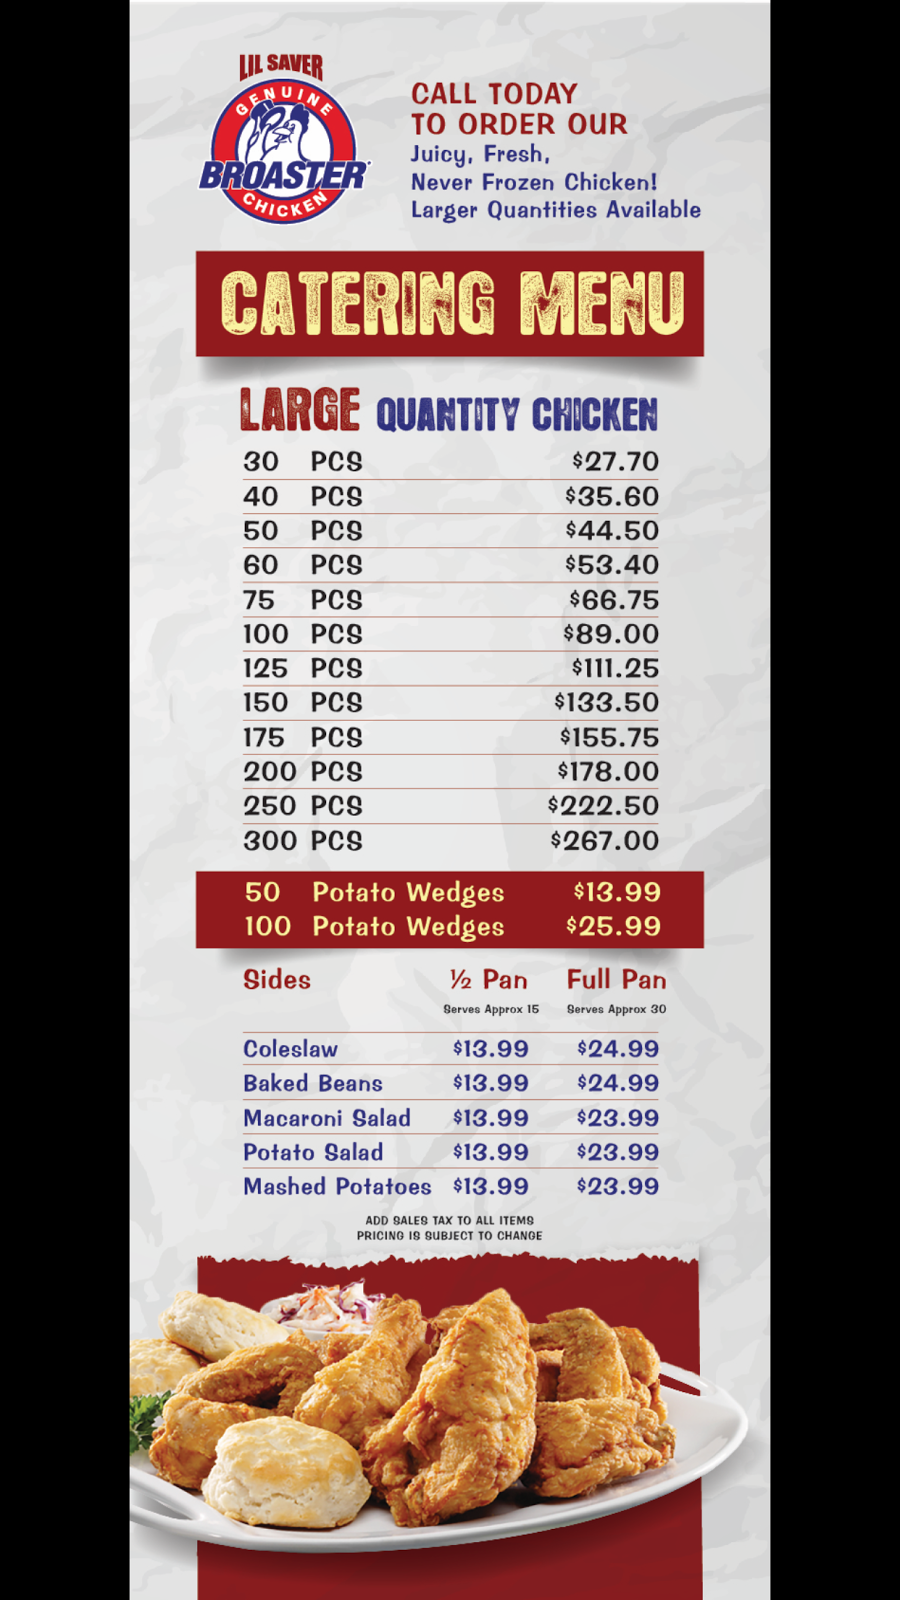 Lil Saver Broaster Chicken - gas station  | Photo 8 of 10 | Address: W, 393 US-6, Valparaiso, IN 46385, USA | Phone: (219) 763-2549